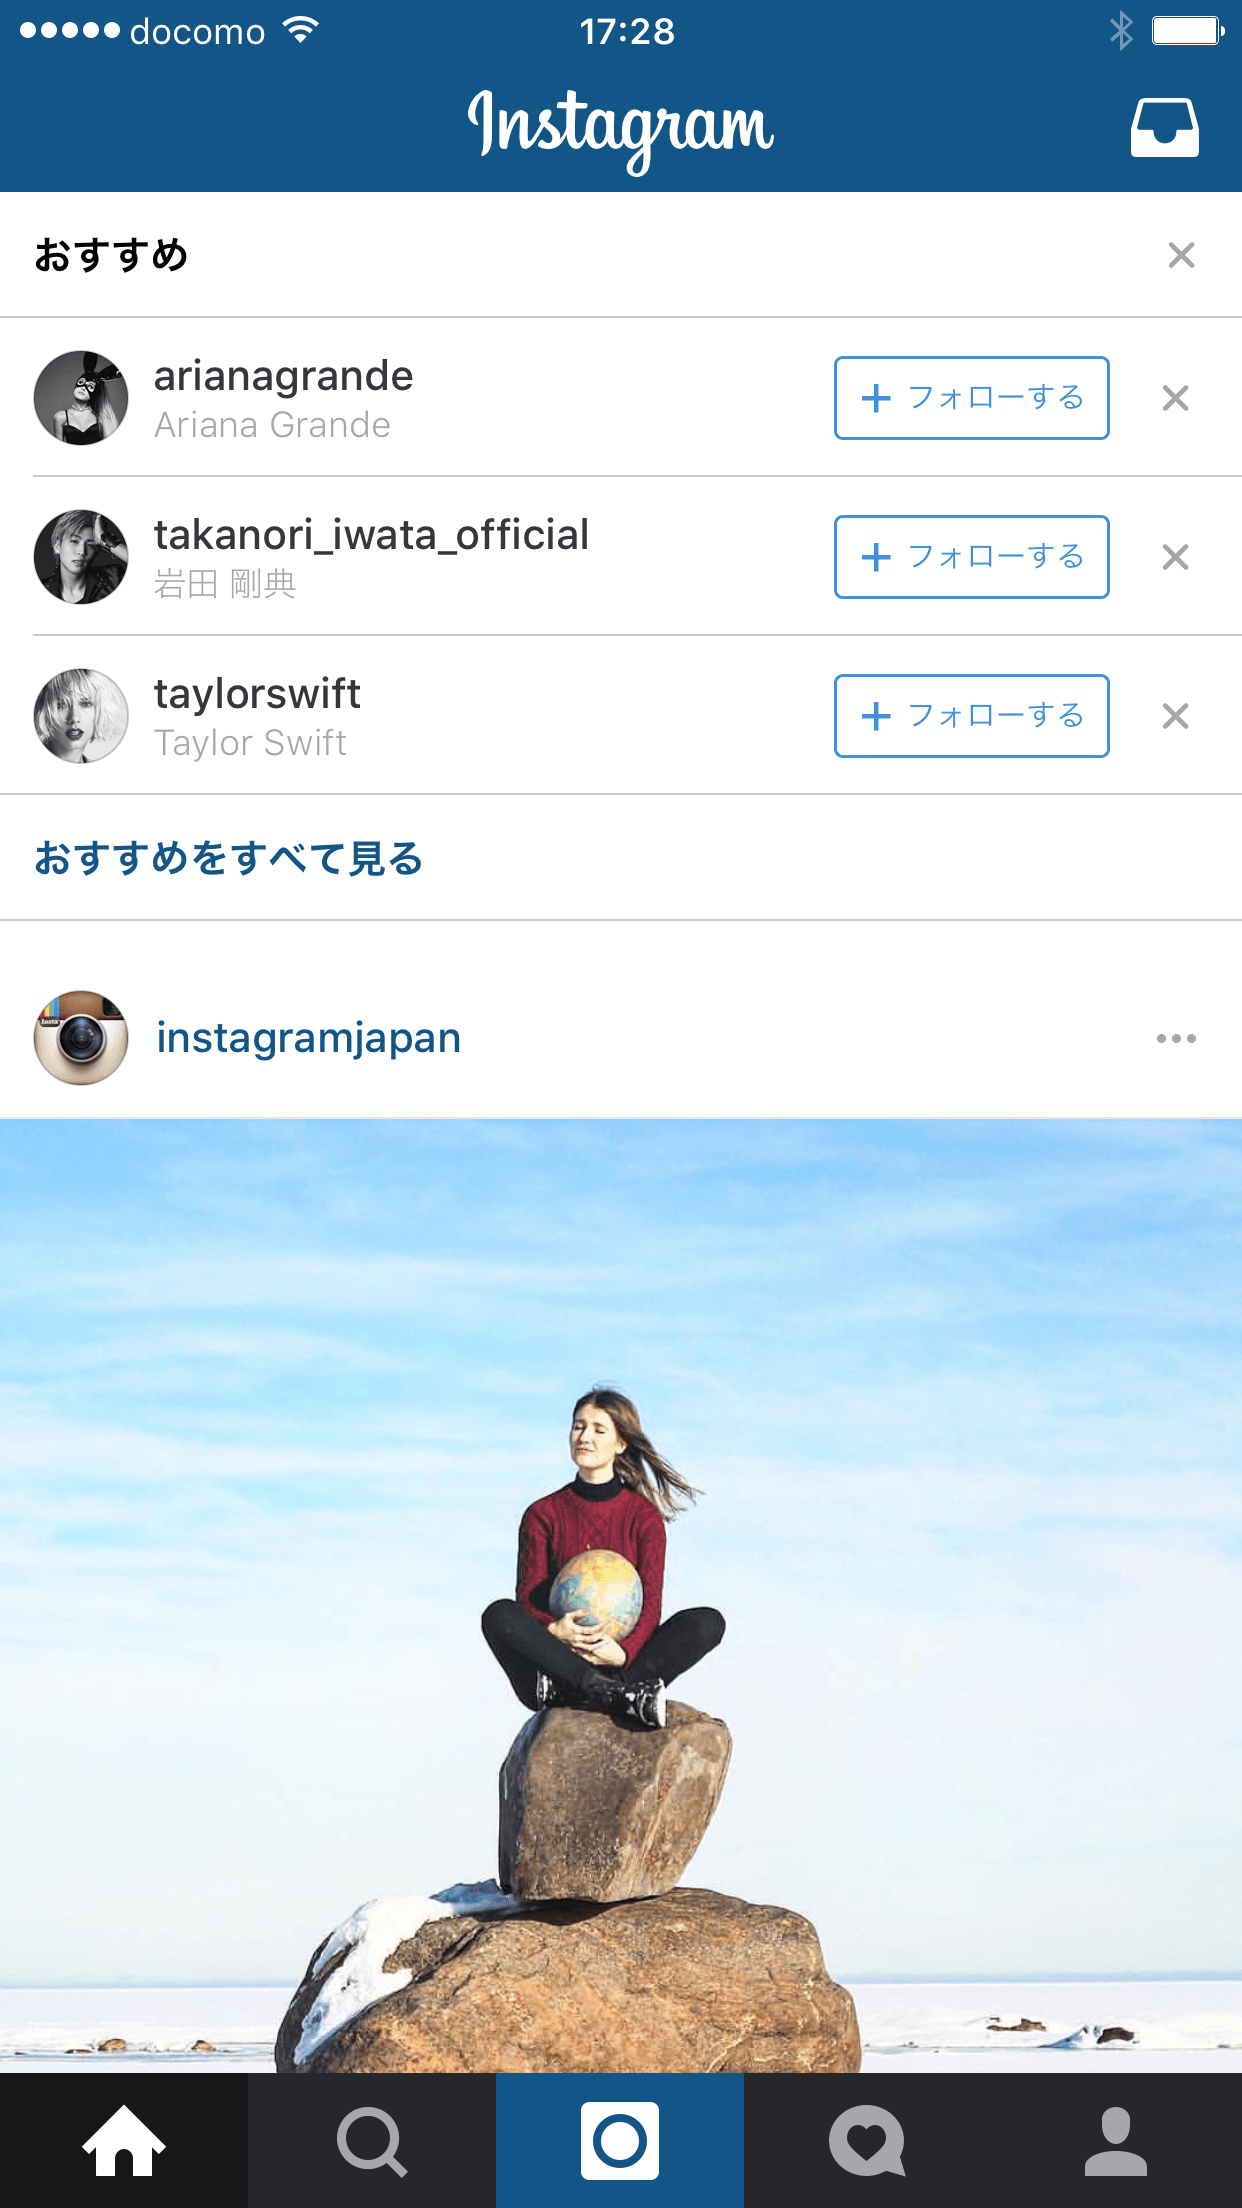 Instagramのフィードが表示された